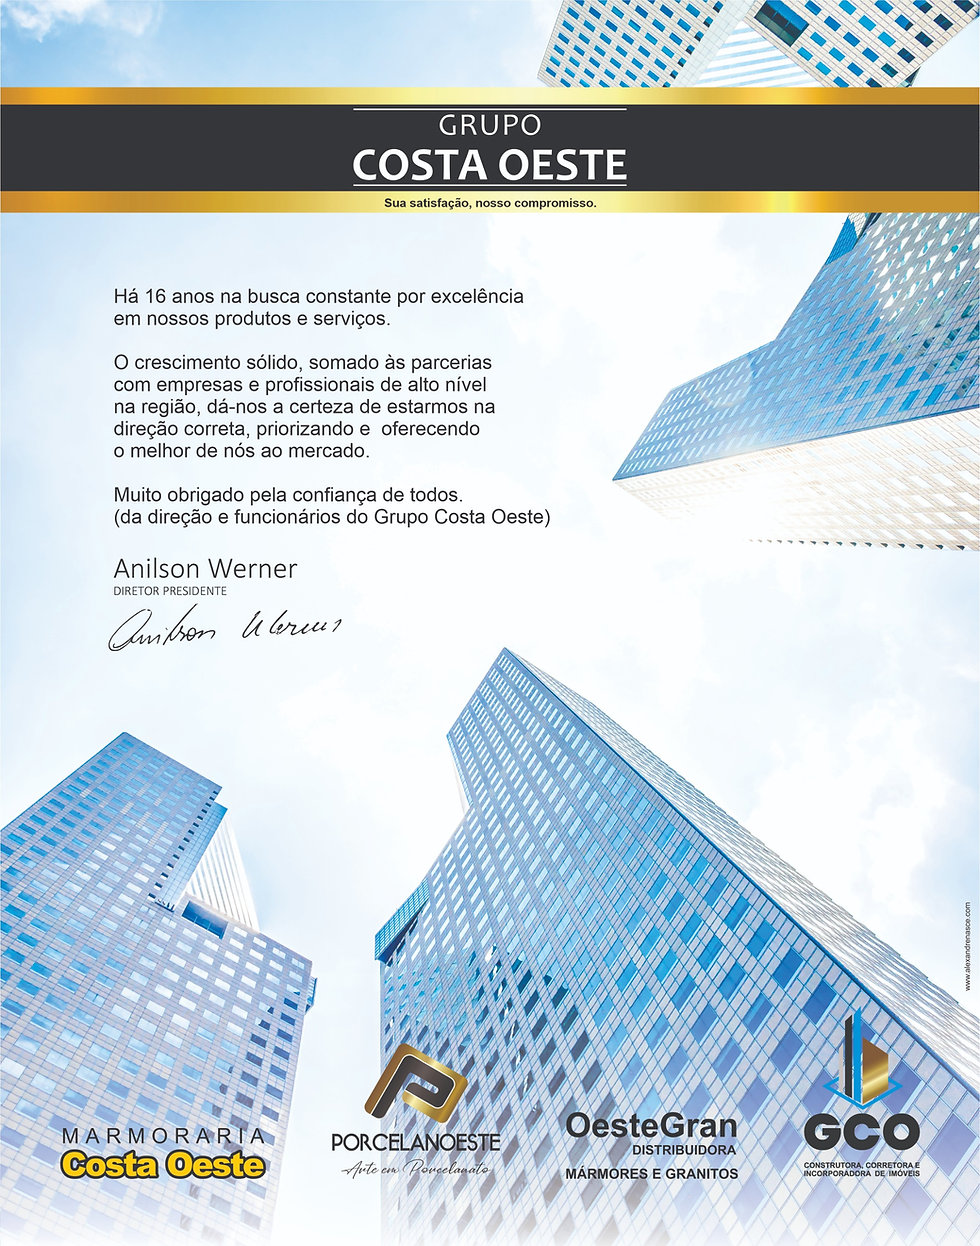 GRUPO COSTA GCO OESTE DEZEMBRO 2020_edit